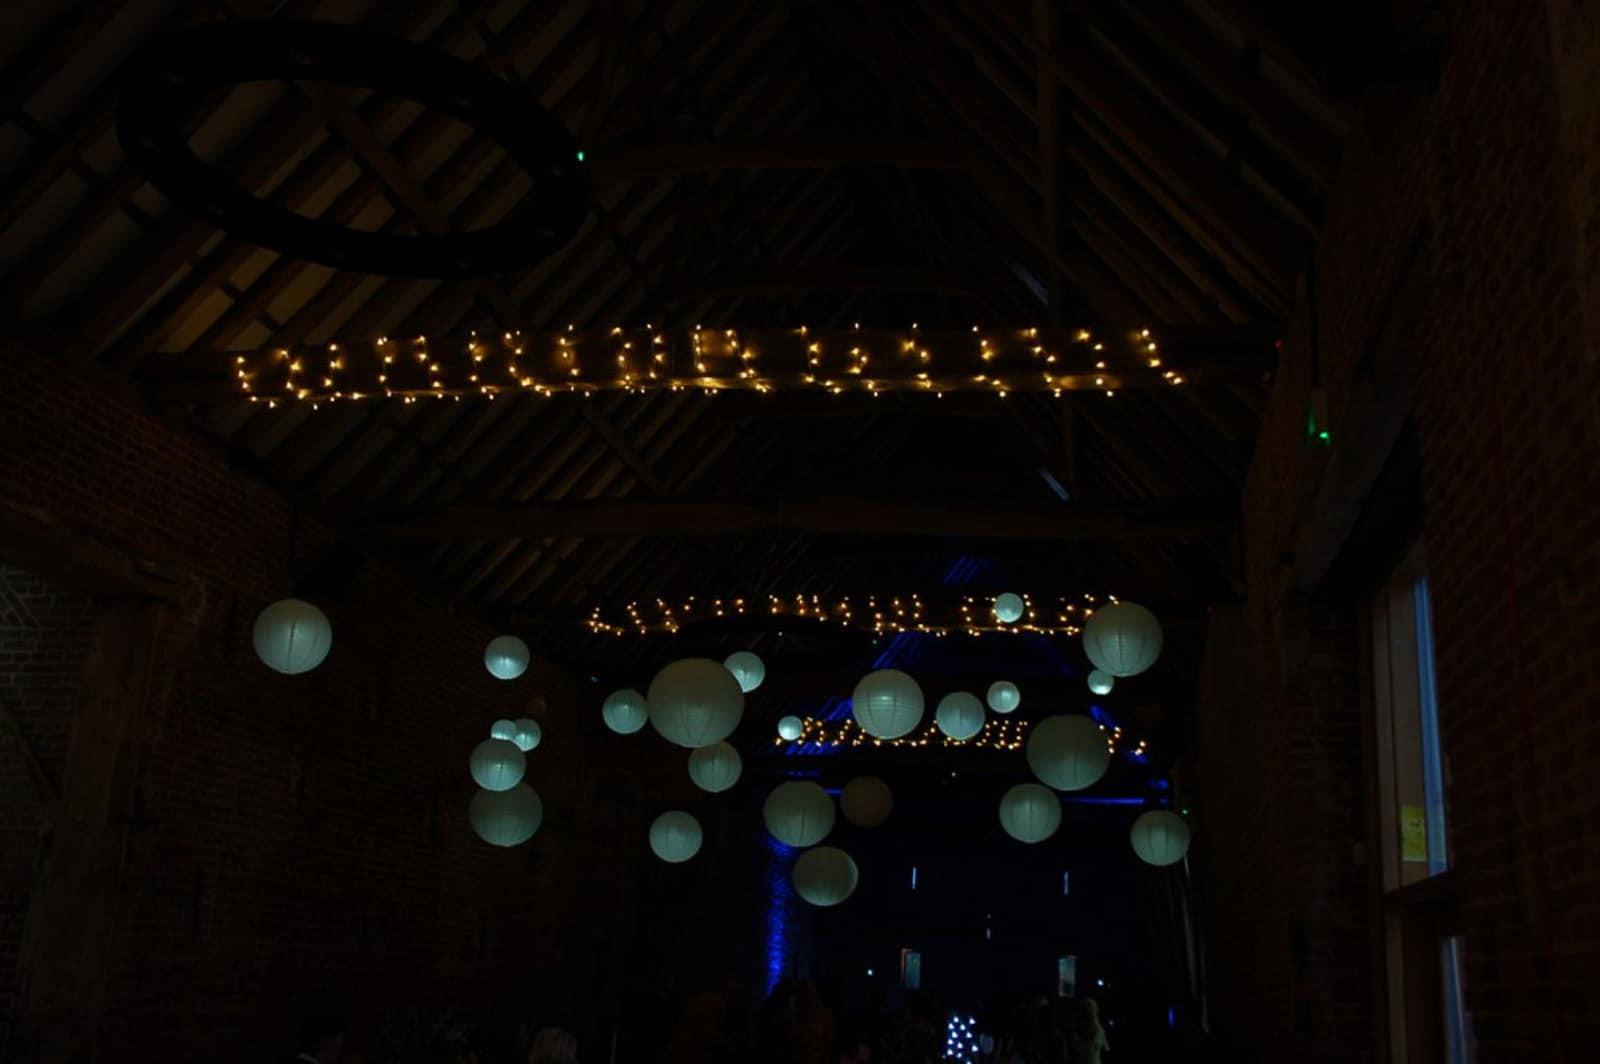 Copdock Hall in lights